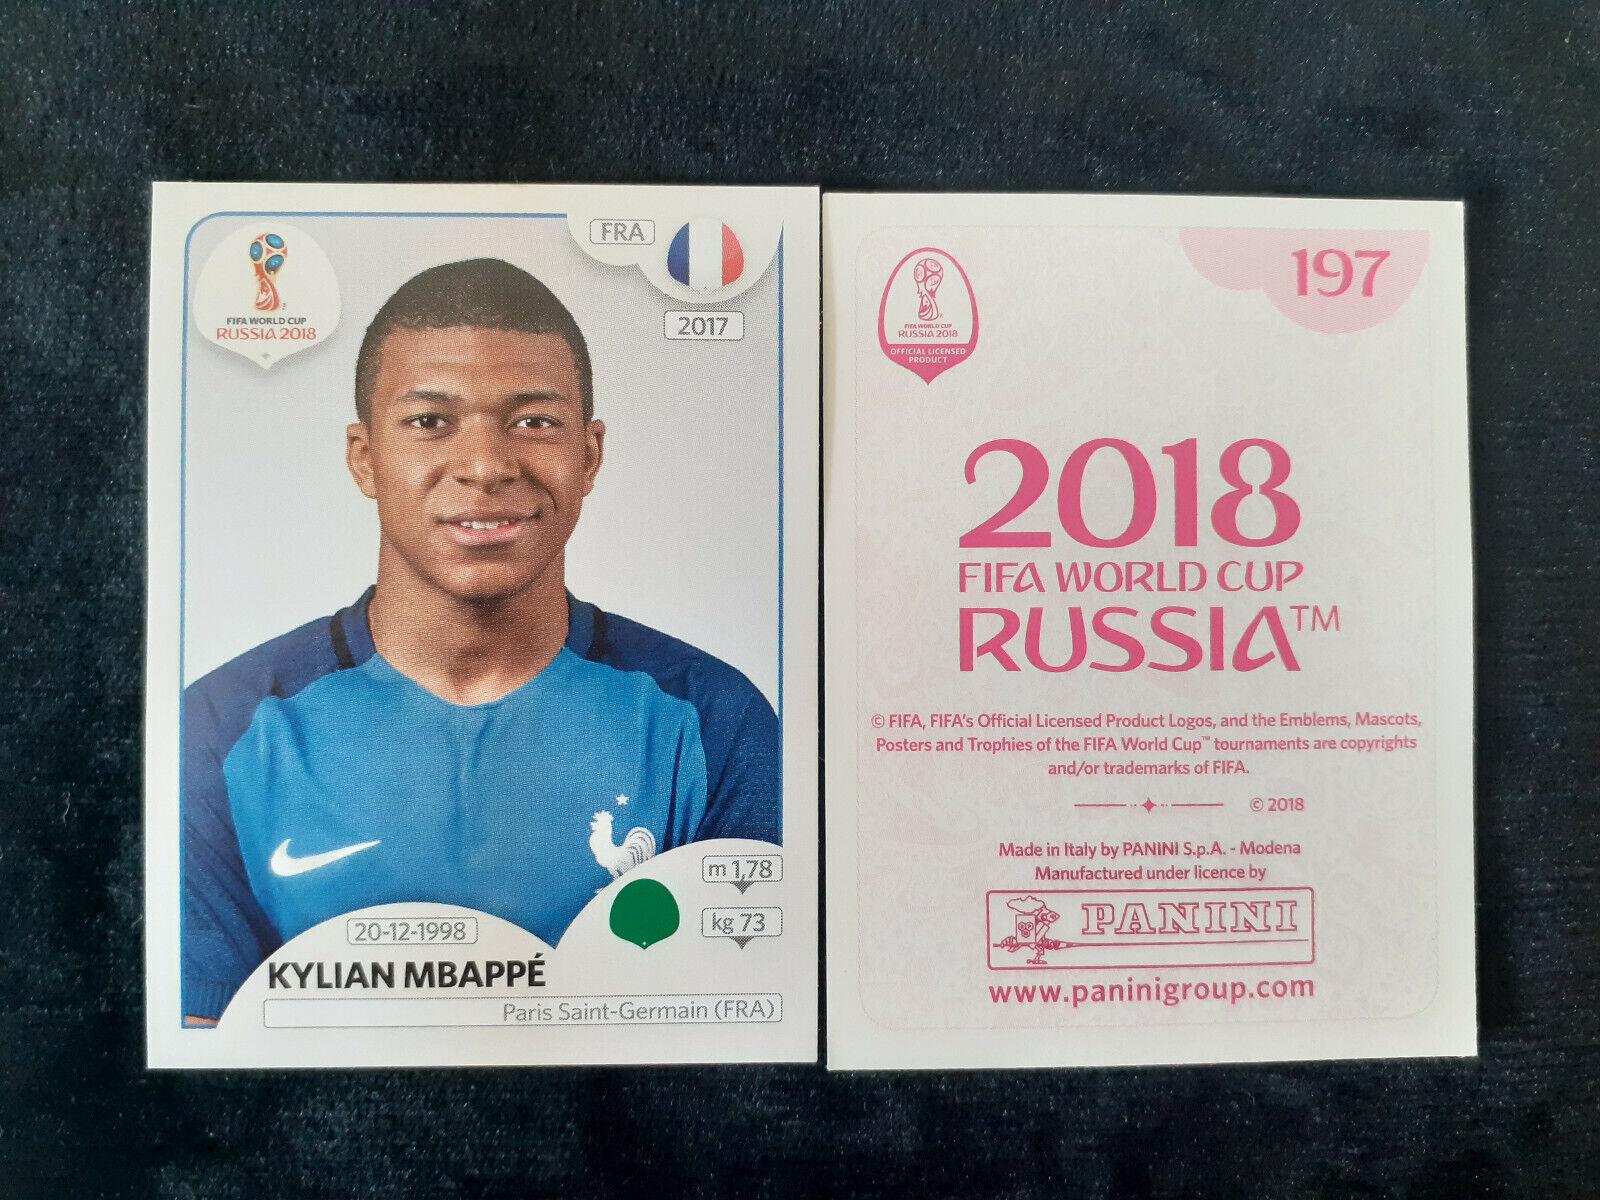 Kylian mbappe rookie superstar mvp 197 sticker paris psg panini world cup 2018